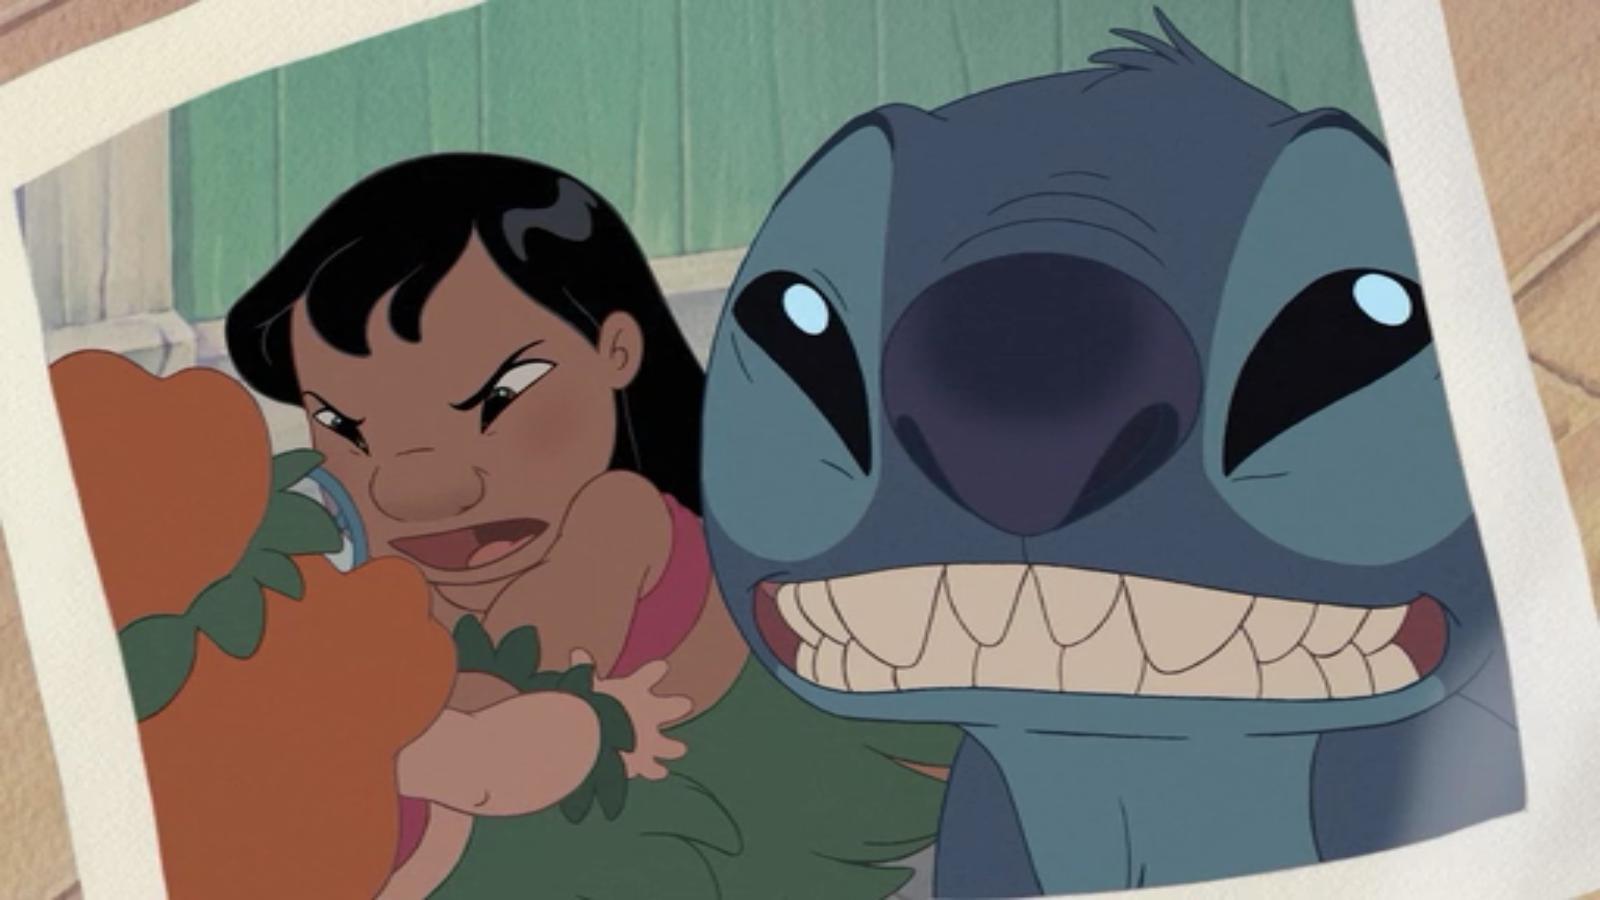 First selfie. I was watching Lilo and Stitch 2 and i saw this selfie. selfie Disney lilo and stitch lilo stitch catfight